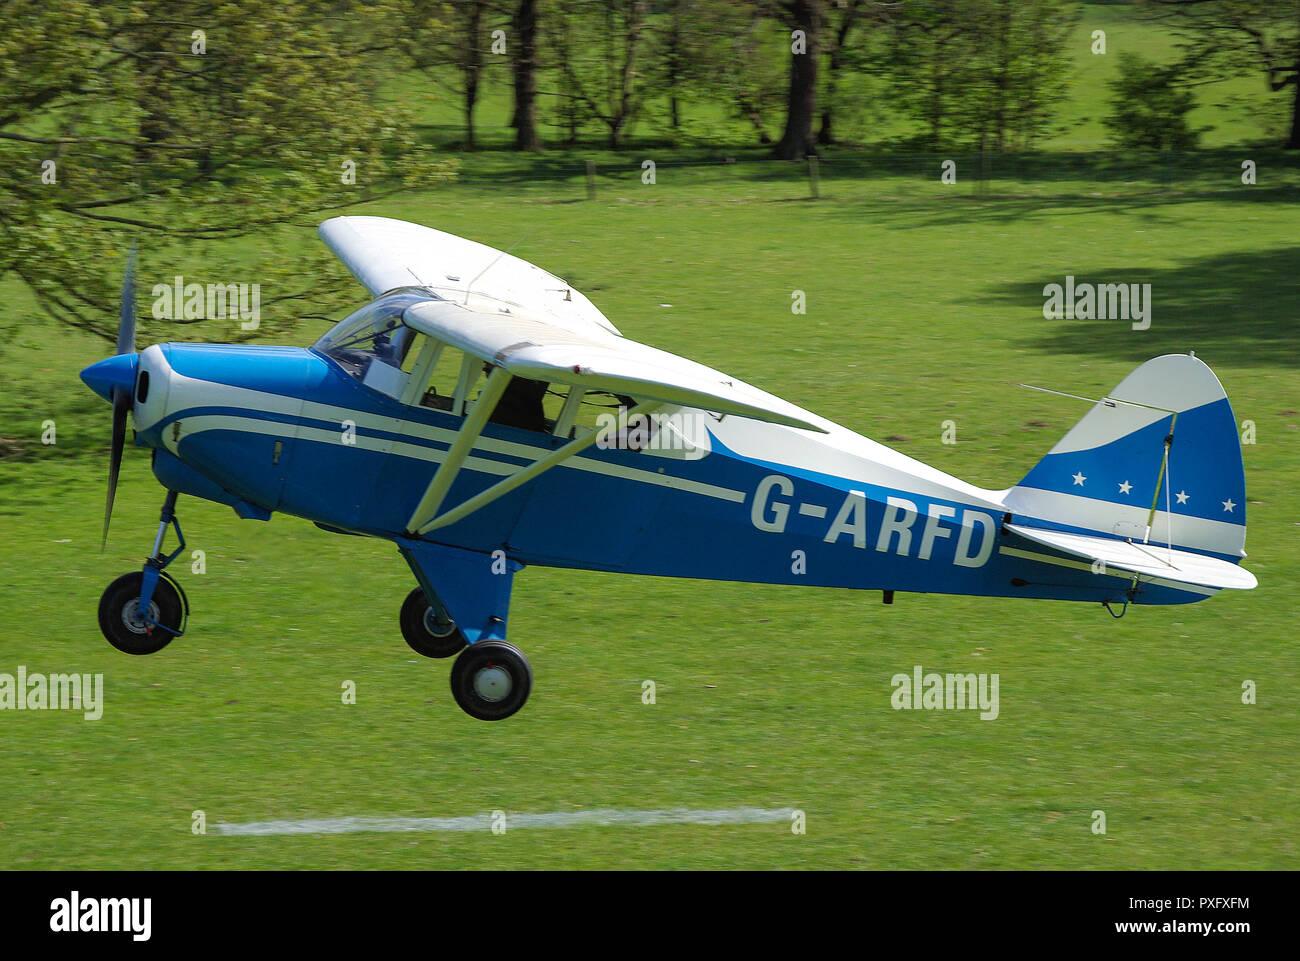 piper-pa22-tri-pacer-plane-taking-off-from-henham-park-suffolk-countryside-grass-airstrip-g-arfd-tripacer-high-wing-monoplane-light-aircraft-PXFXFM.jpg